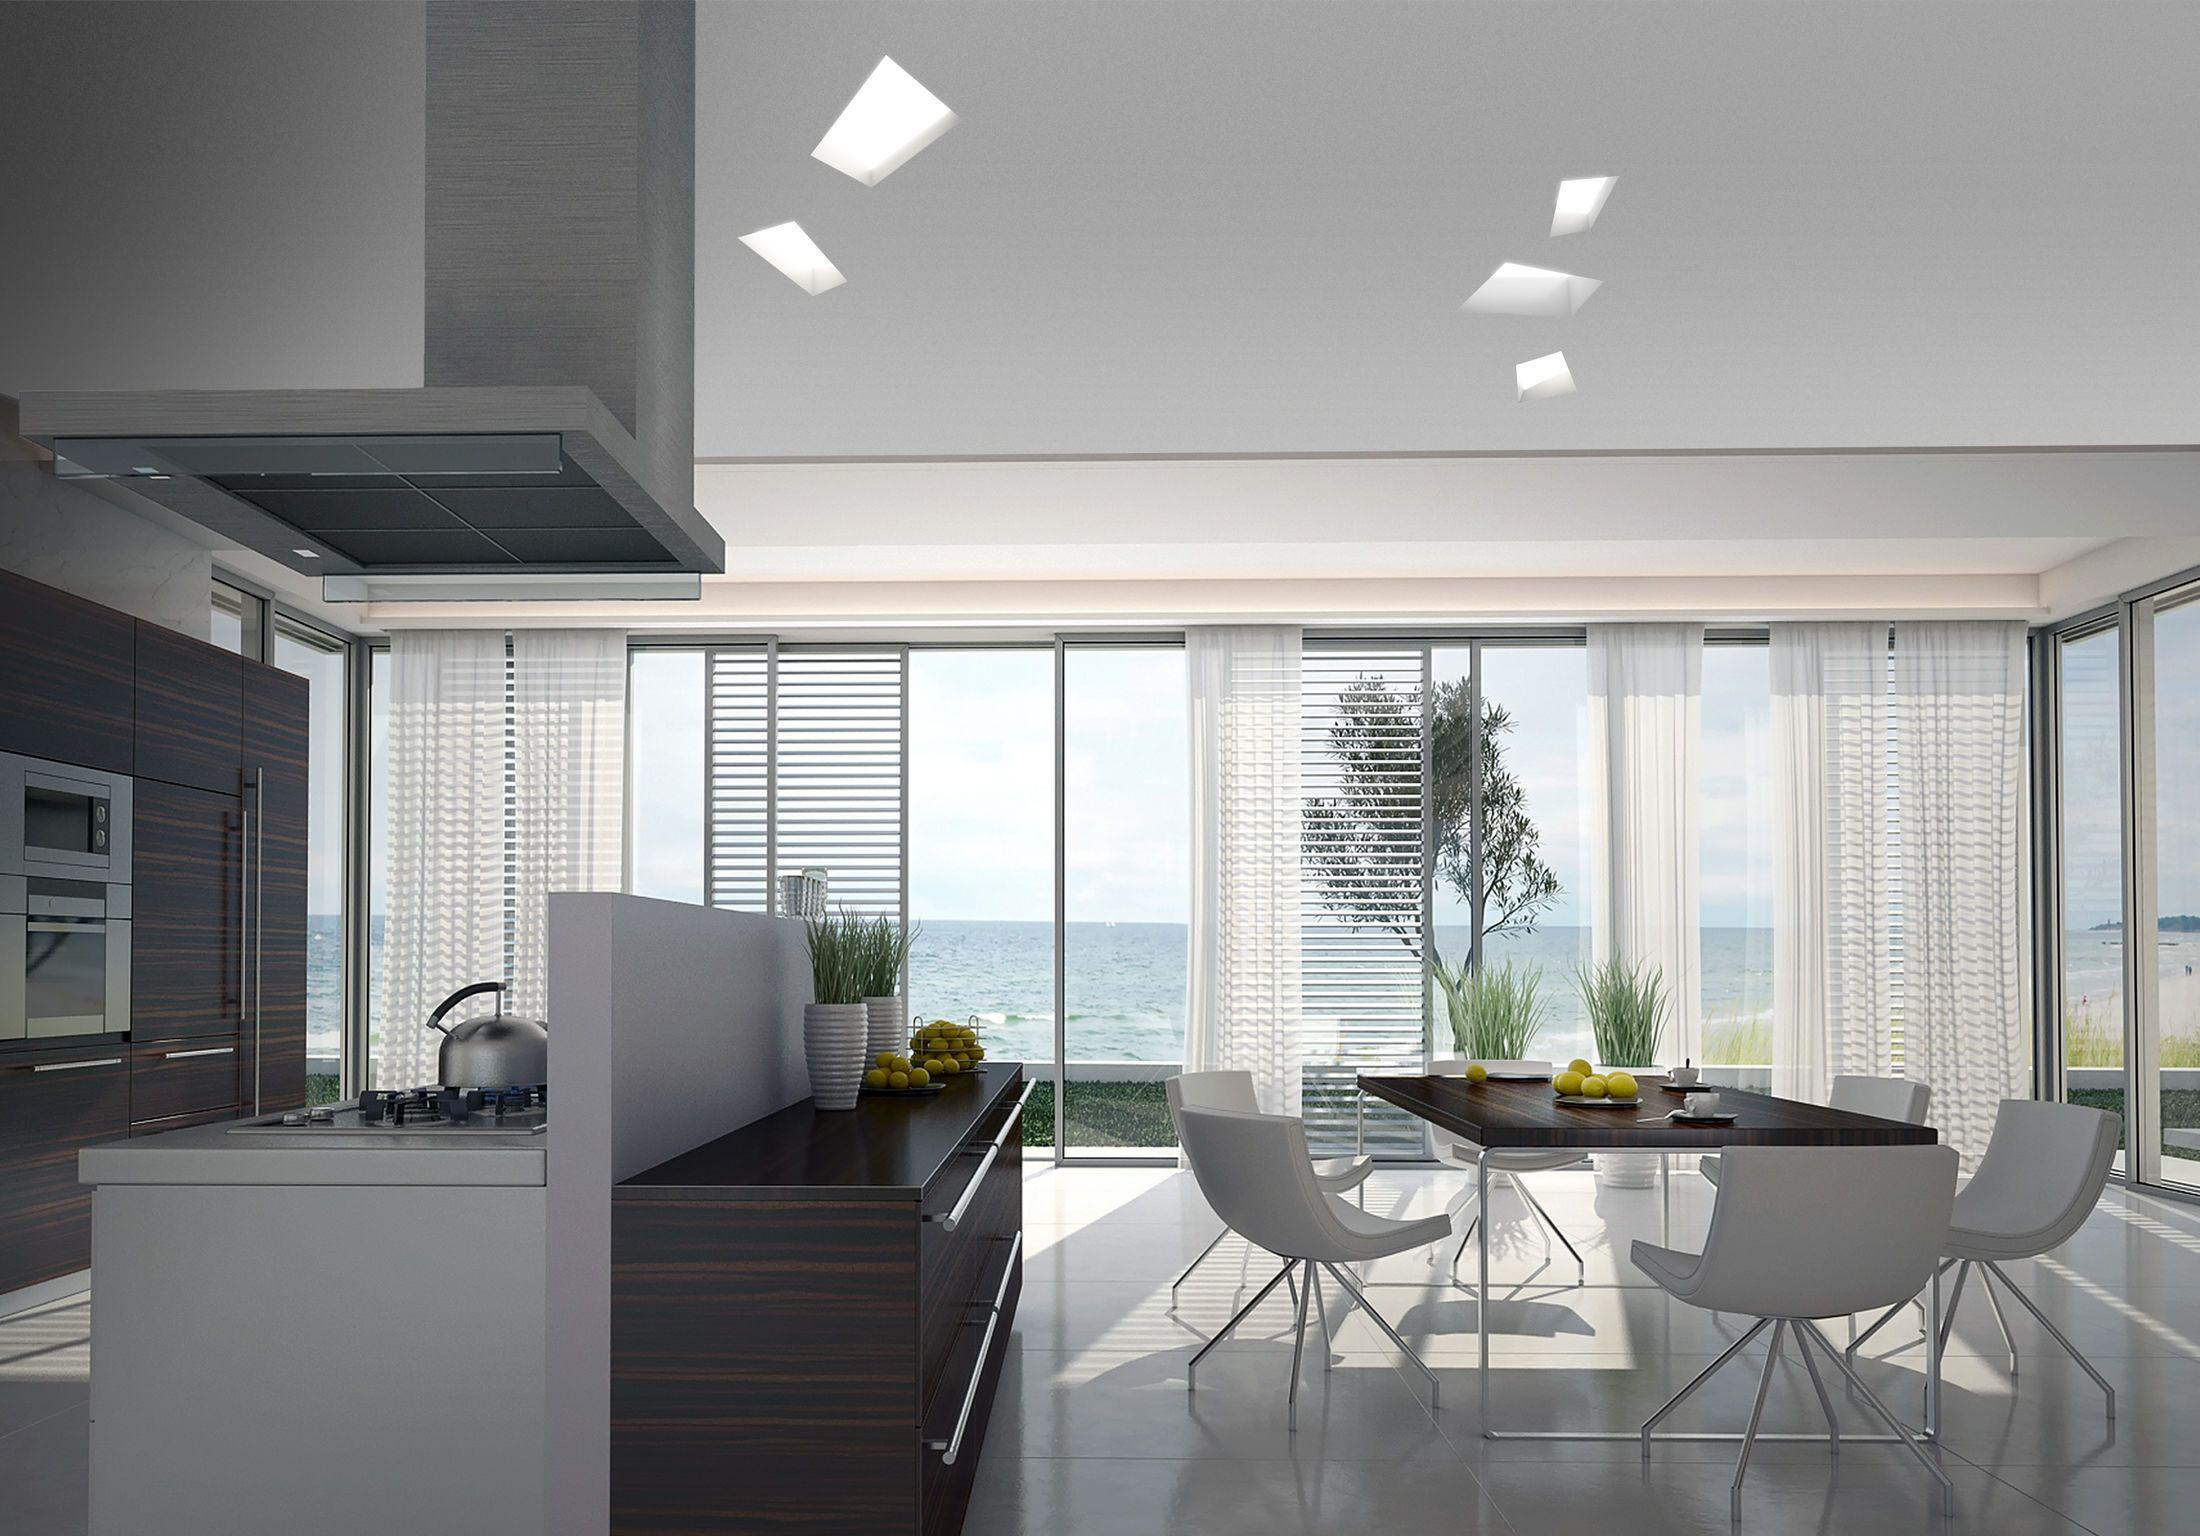 TRAPEZ | Interior lighting decorations. | Pinterest | Trapez